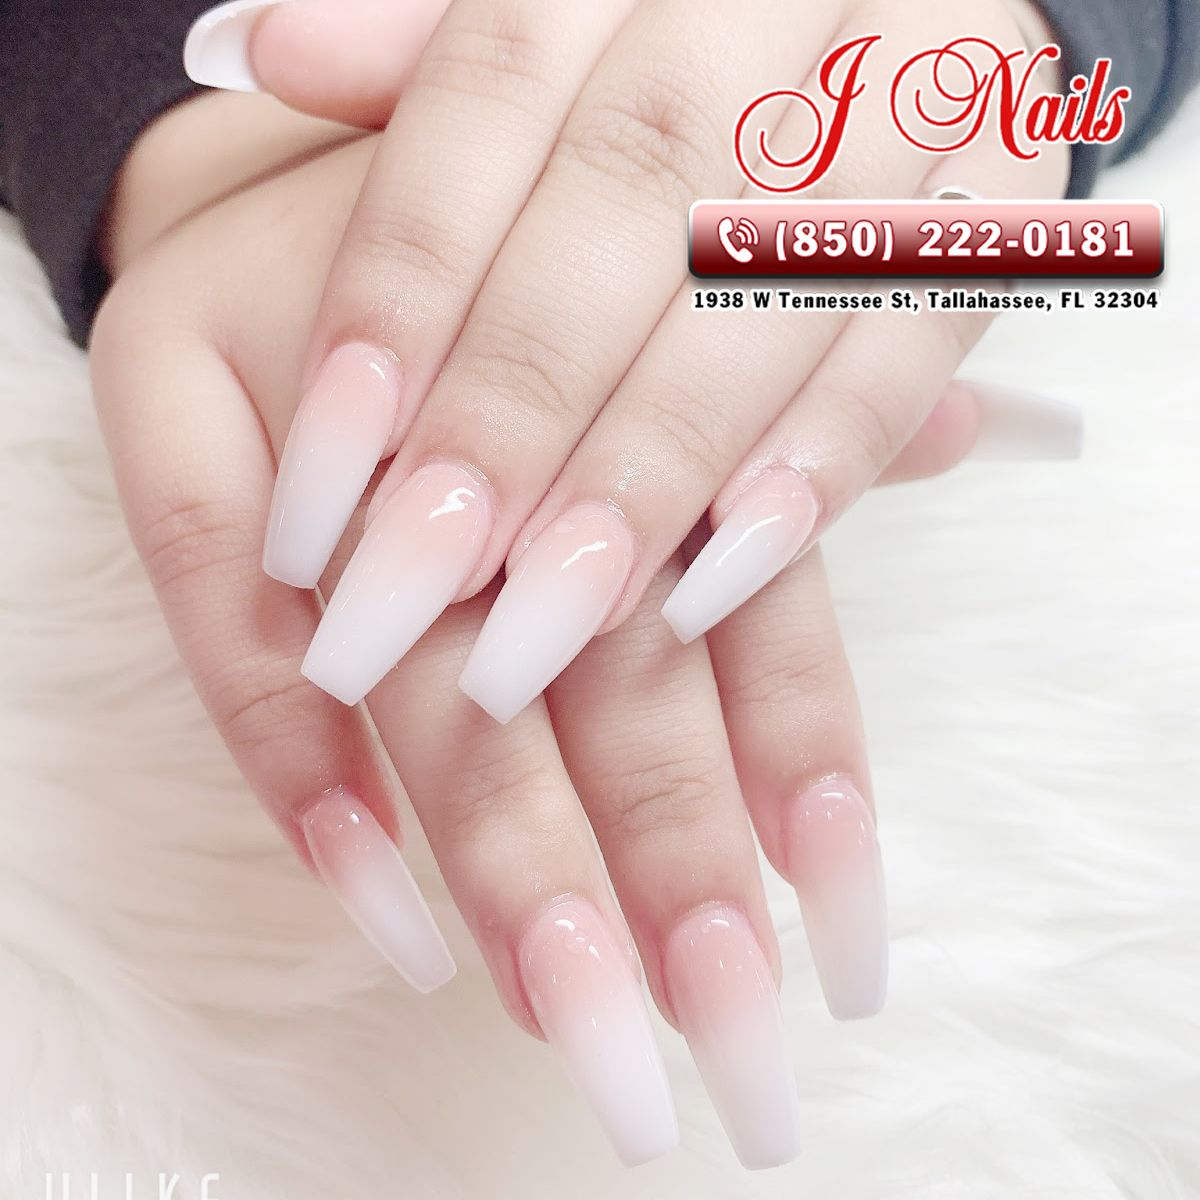 J Nails Nail Salon Tallahassee Fl 32304 In 2021 J Nails Manicure And Pedicure Nails